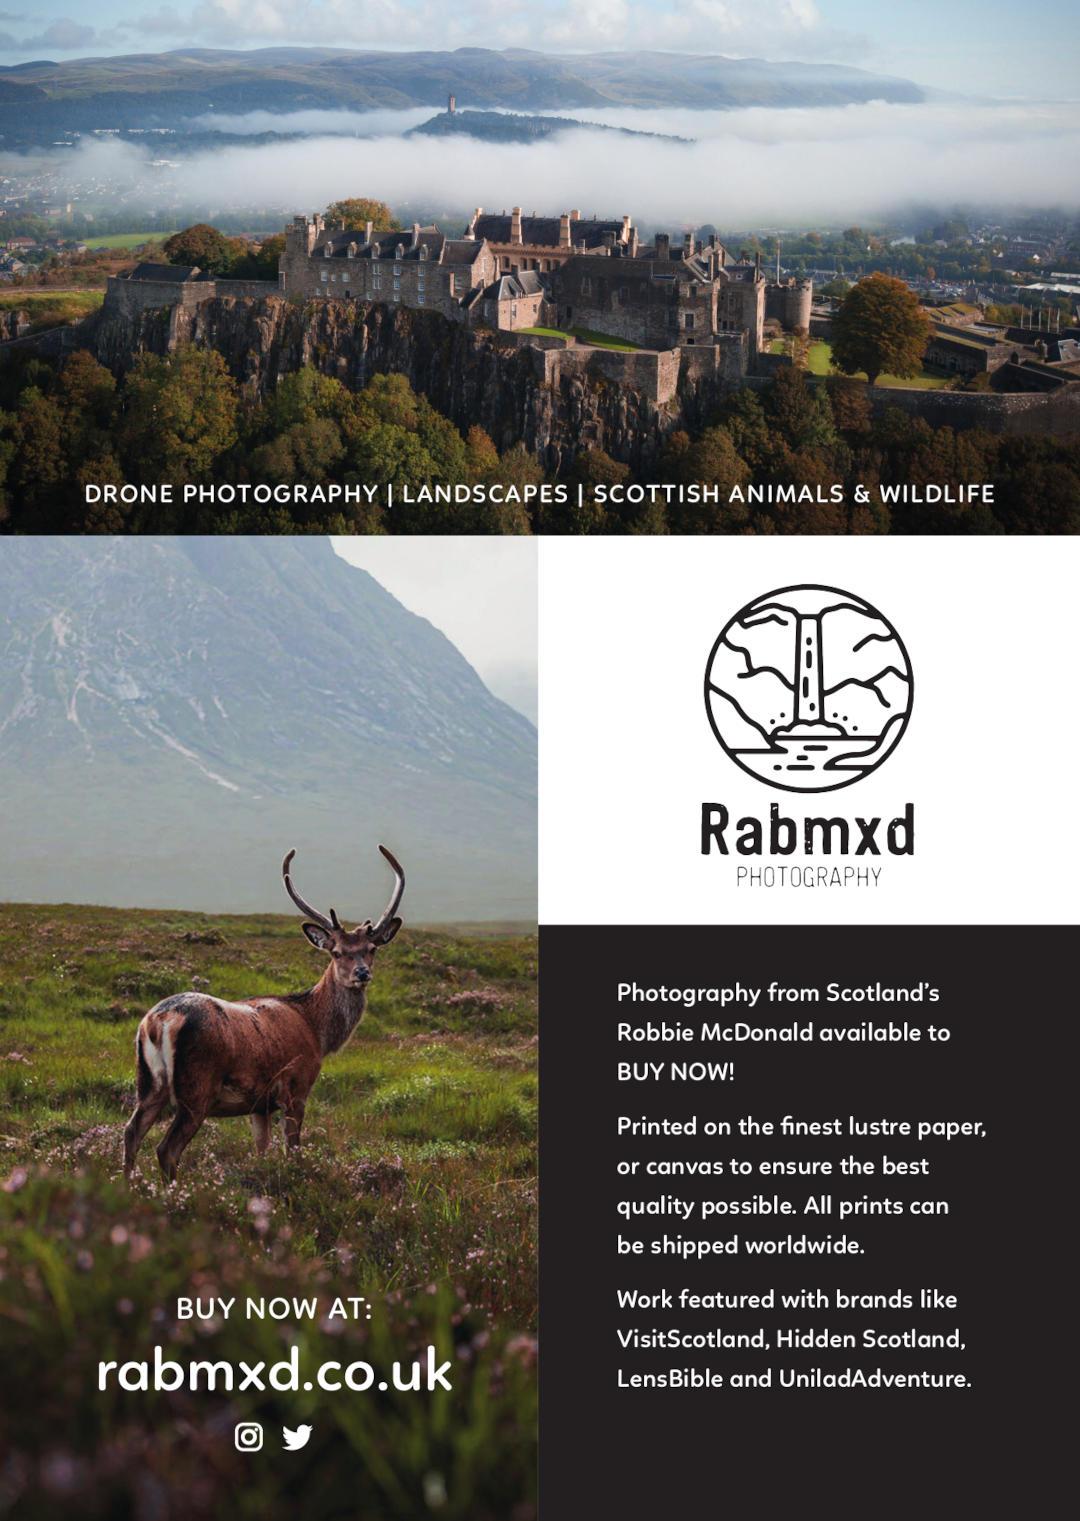 Robbie McDonald Photography - visit Rabmxd.co.uk